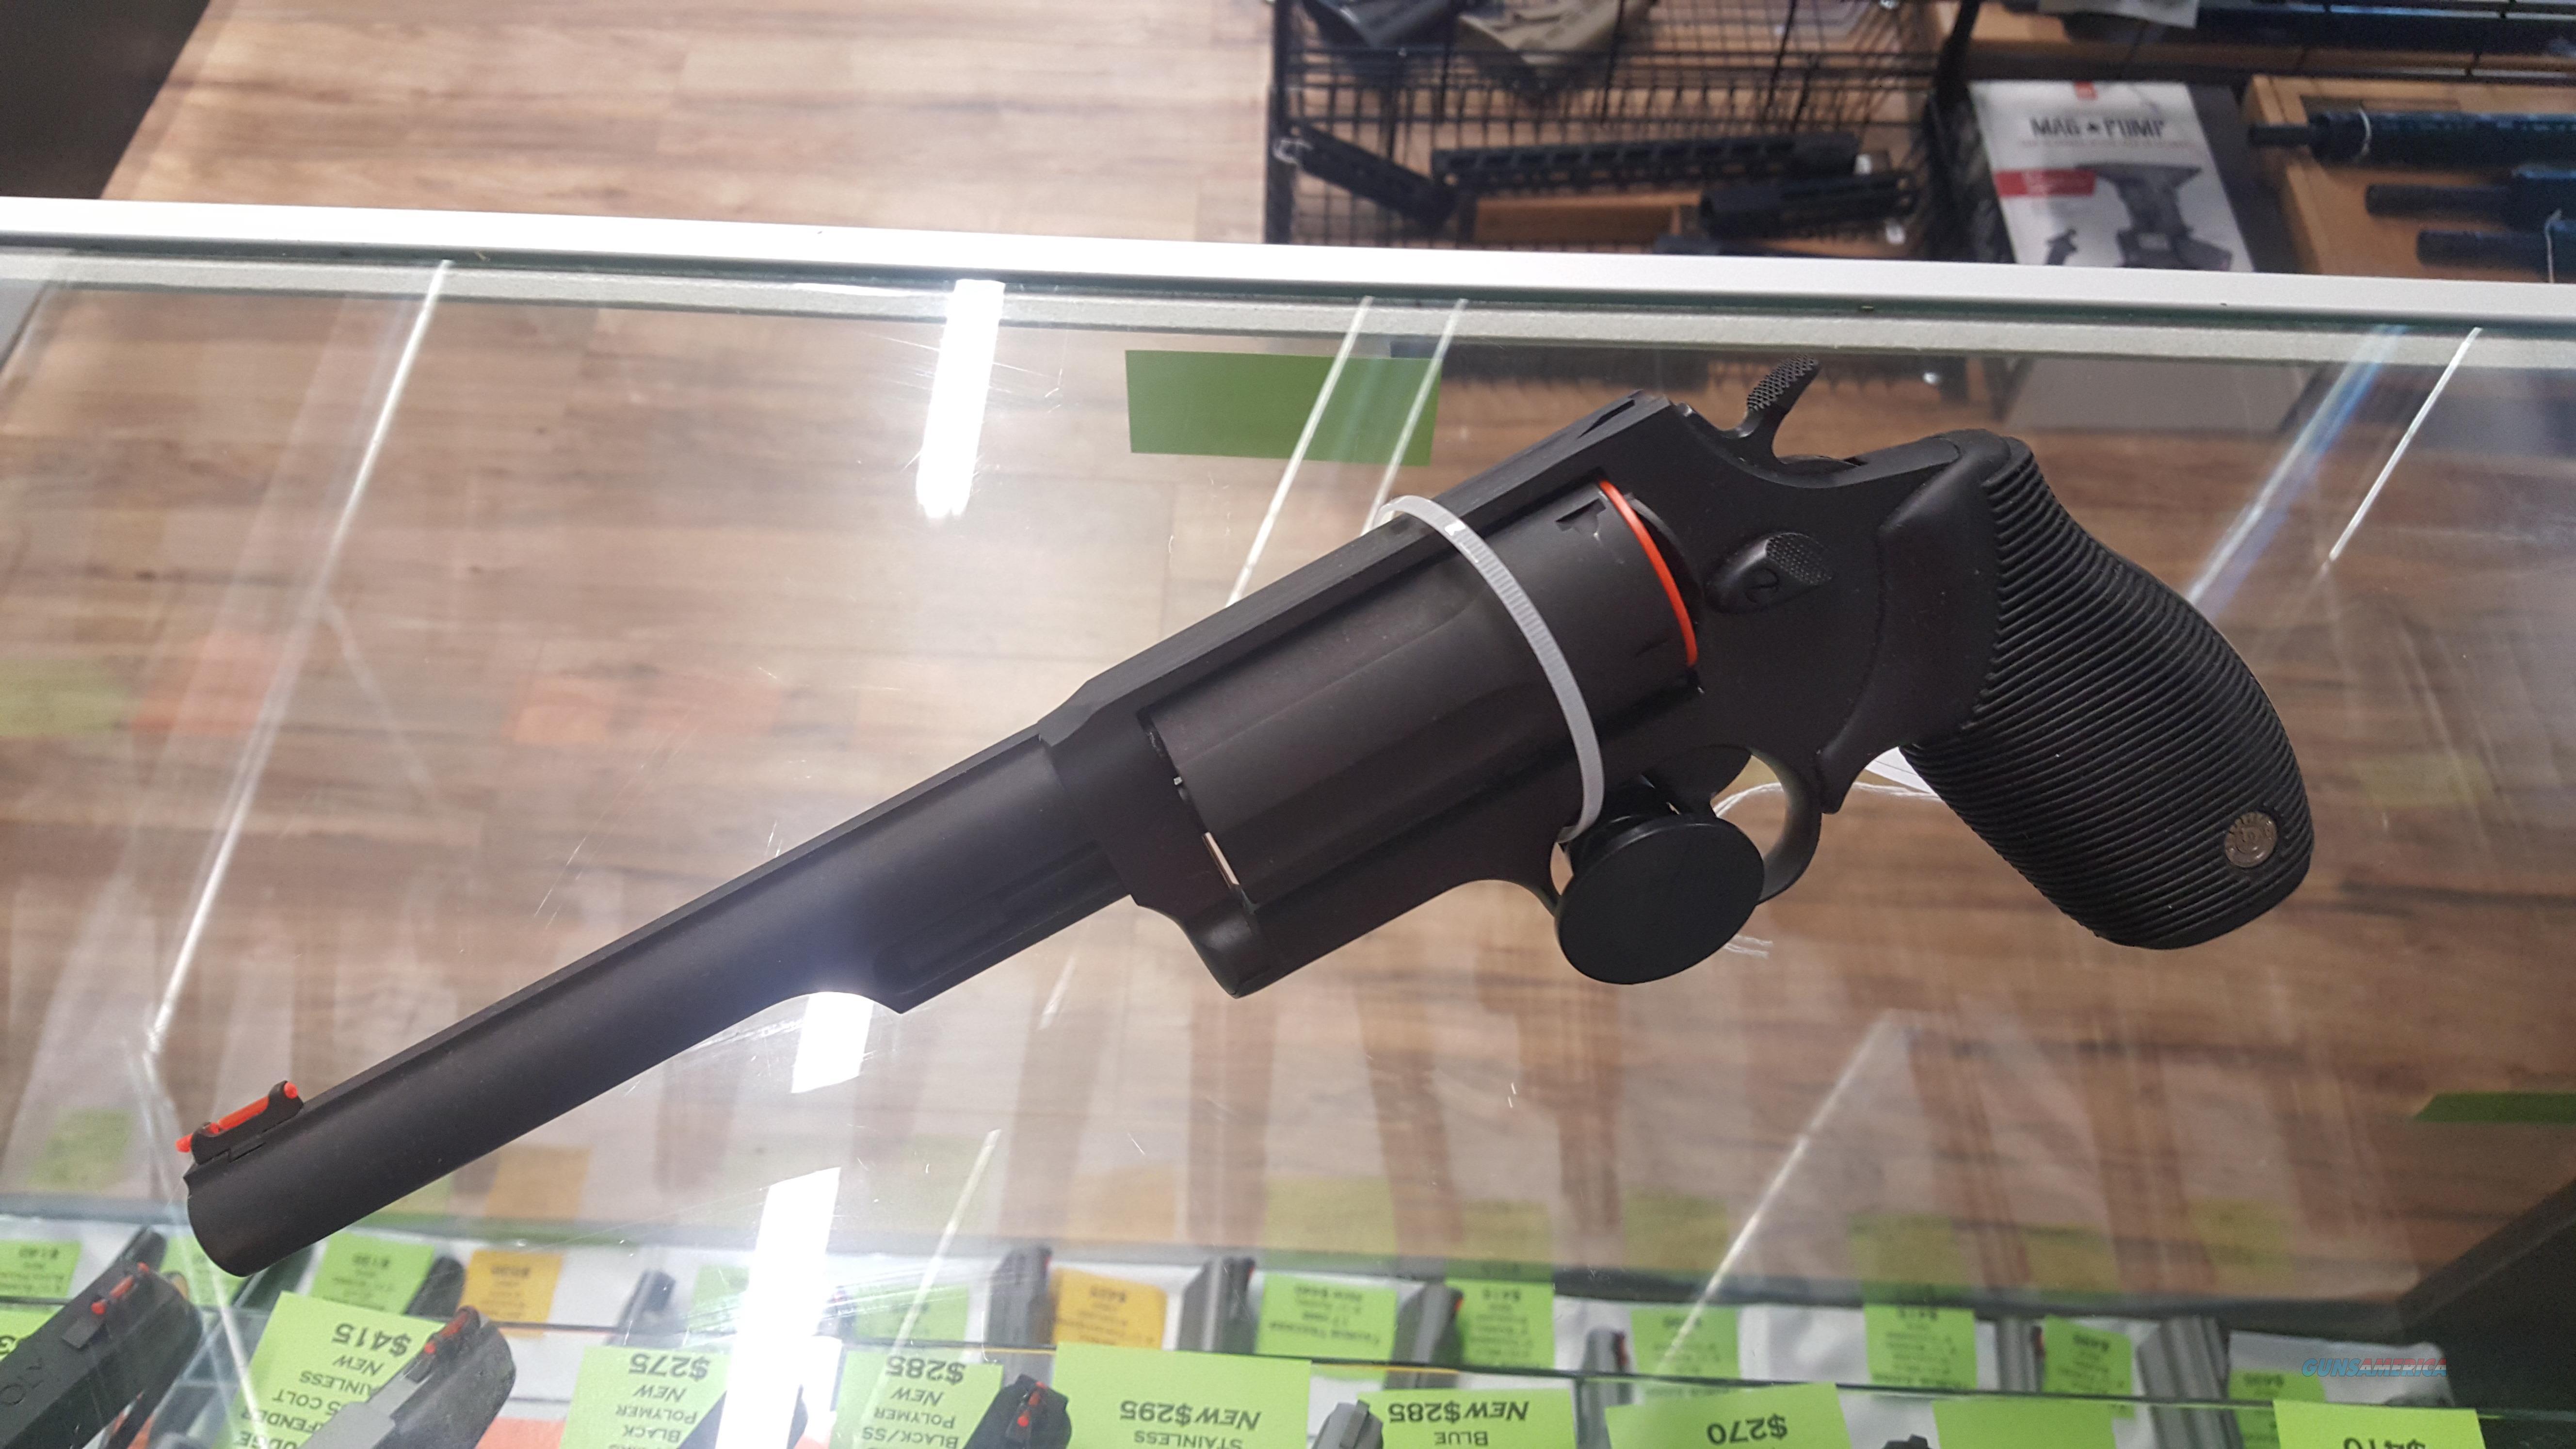 "Taurus Judge 6 1/2"" Blued Revolver, 3"" Chambered! NEW  Guns > Pistols > Taurus Pistols > Revolvers"